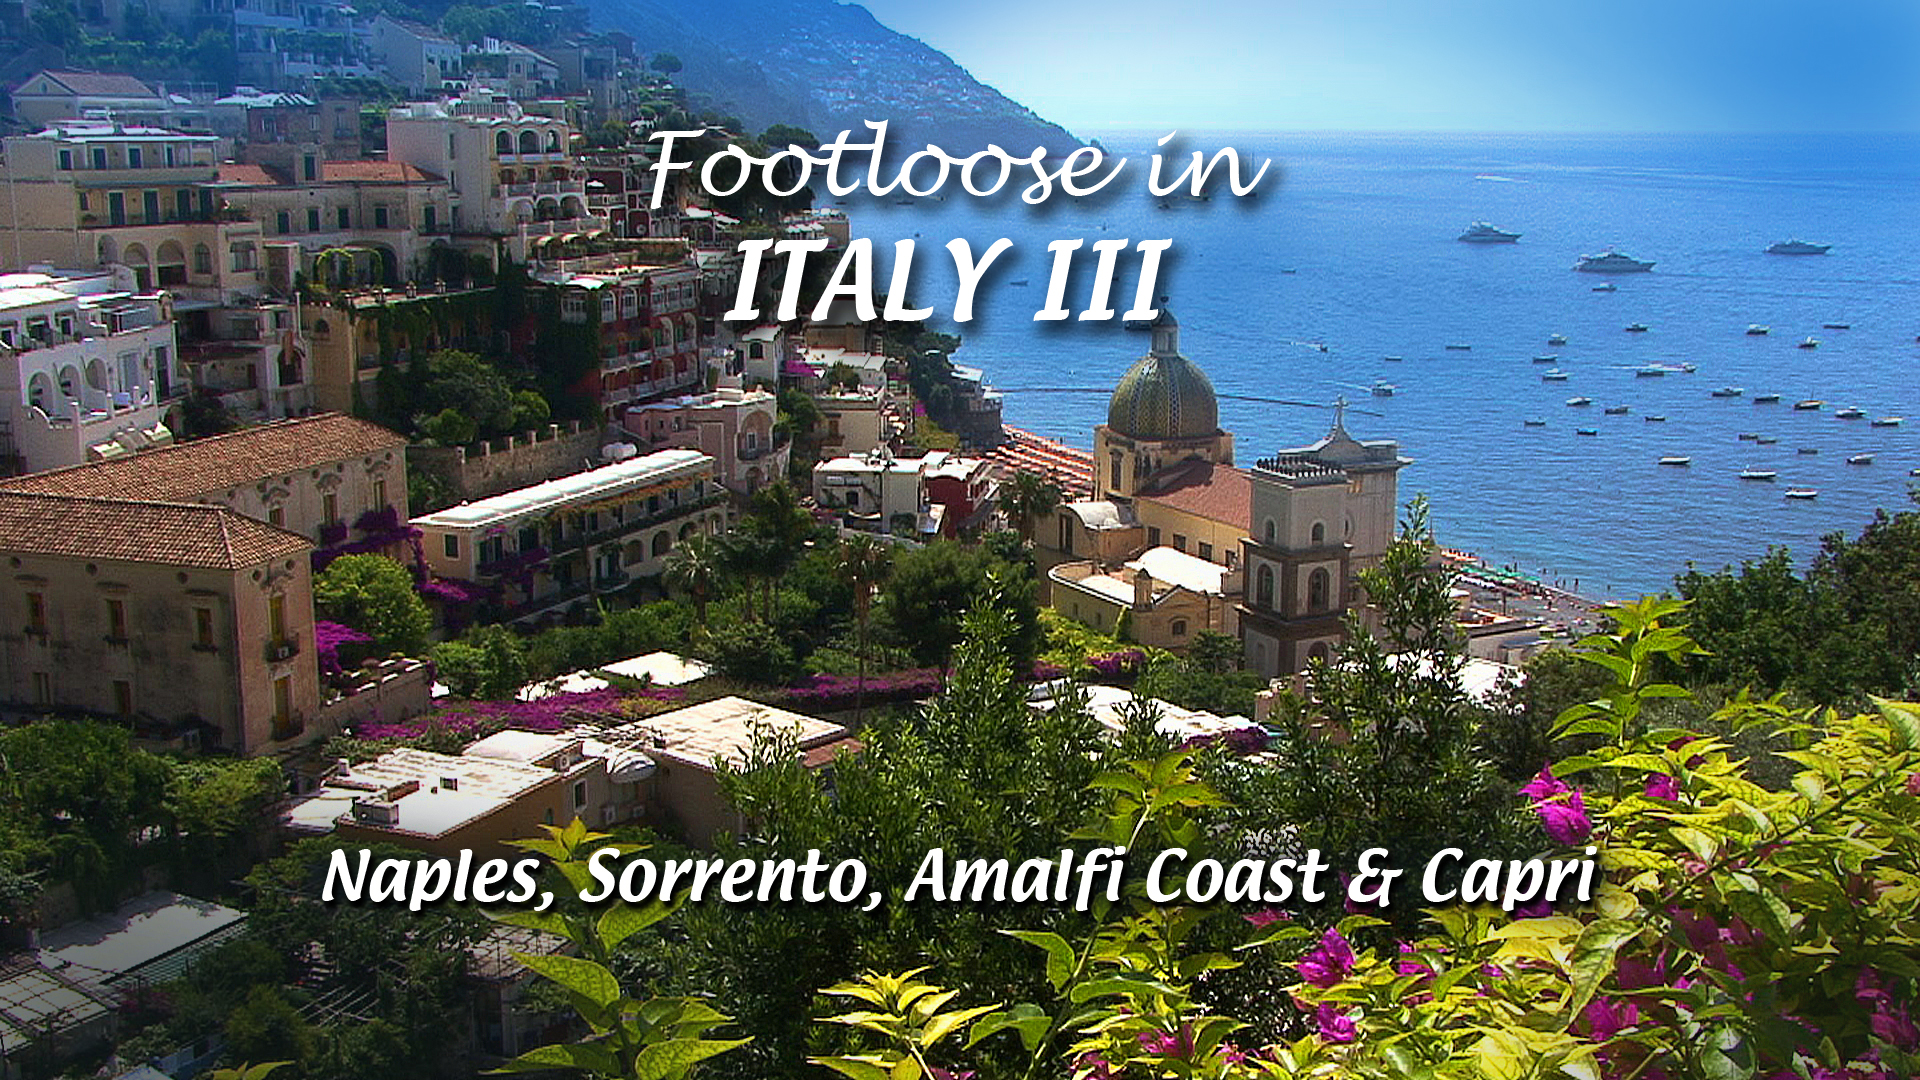 Footloose in Italy III - 3 Naples, Sorrento, Amalfi Coast and Capri